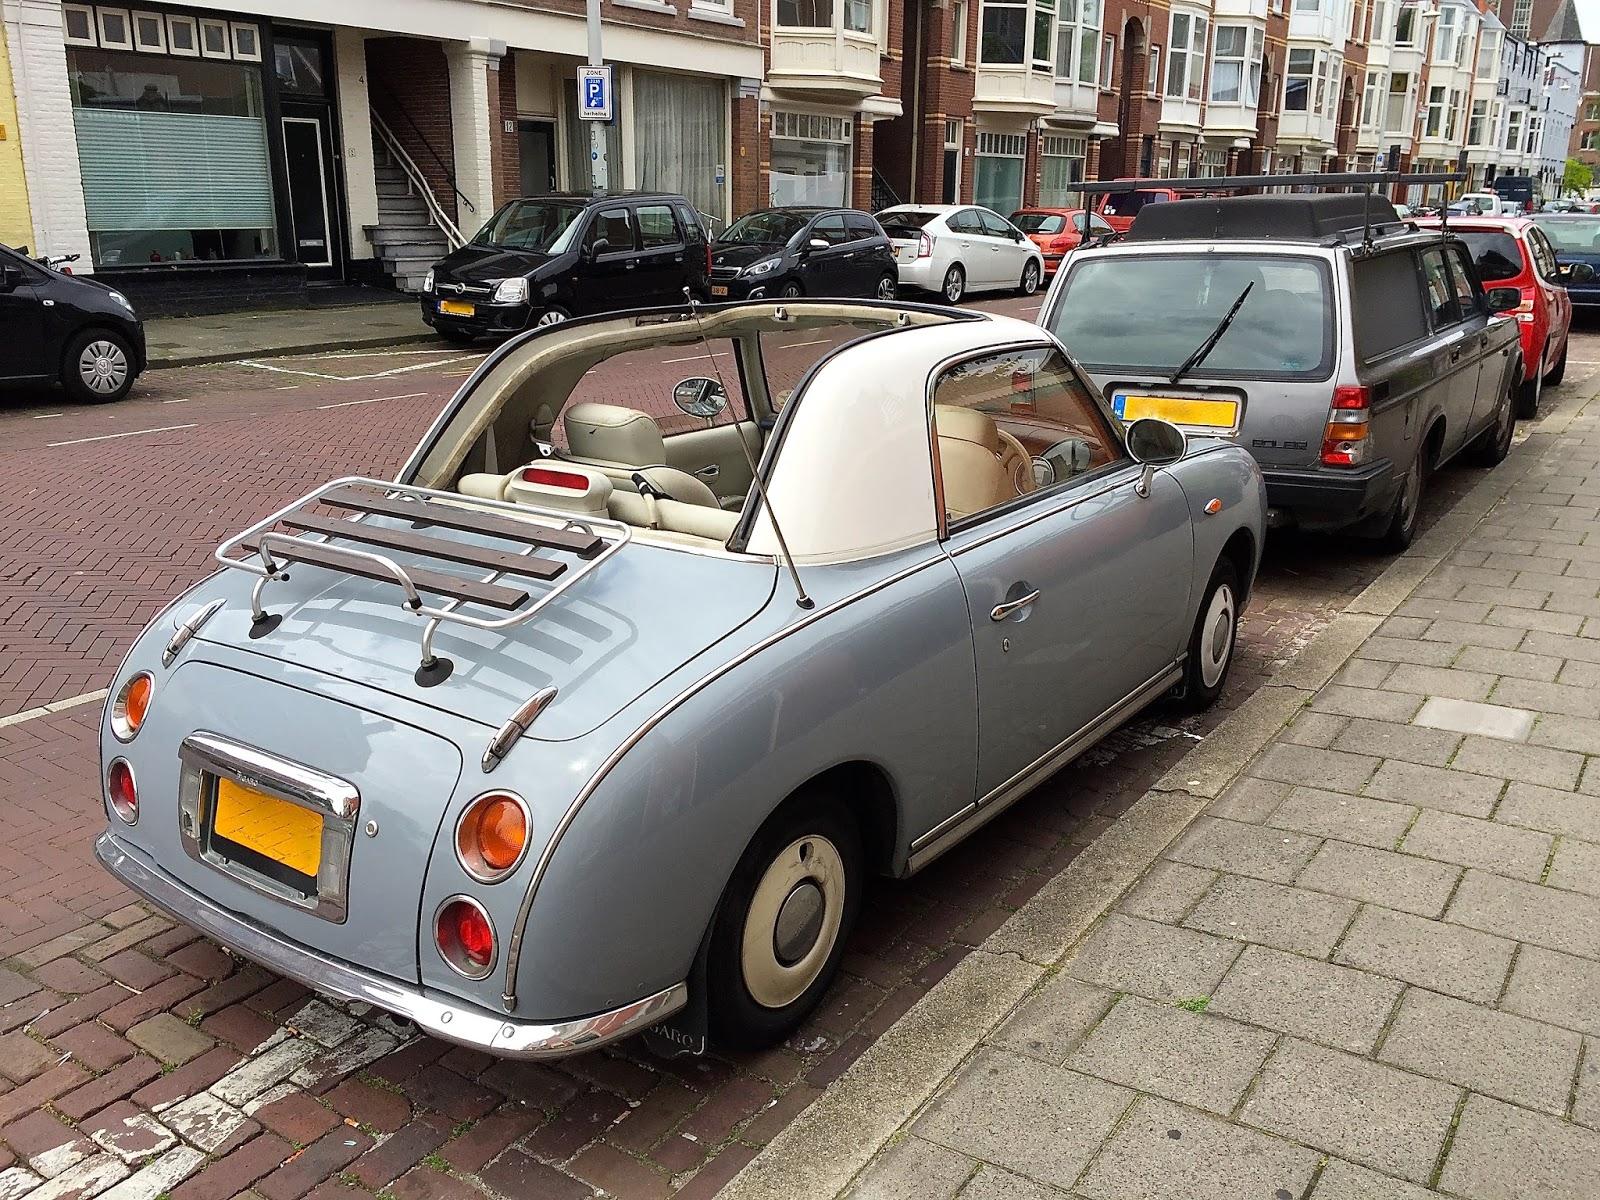 poeschl on cars : Mass-Produced Customs-----Nissan Pike Cars: Pao ...